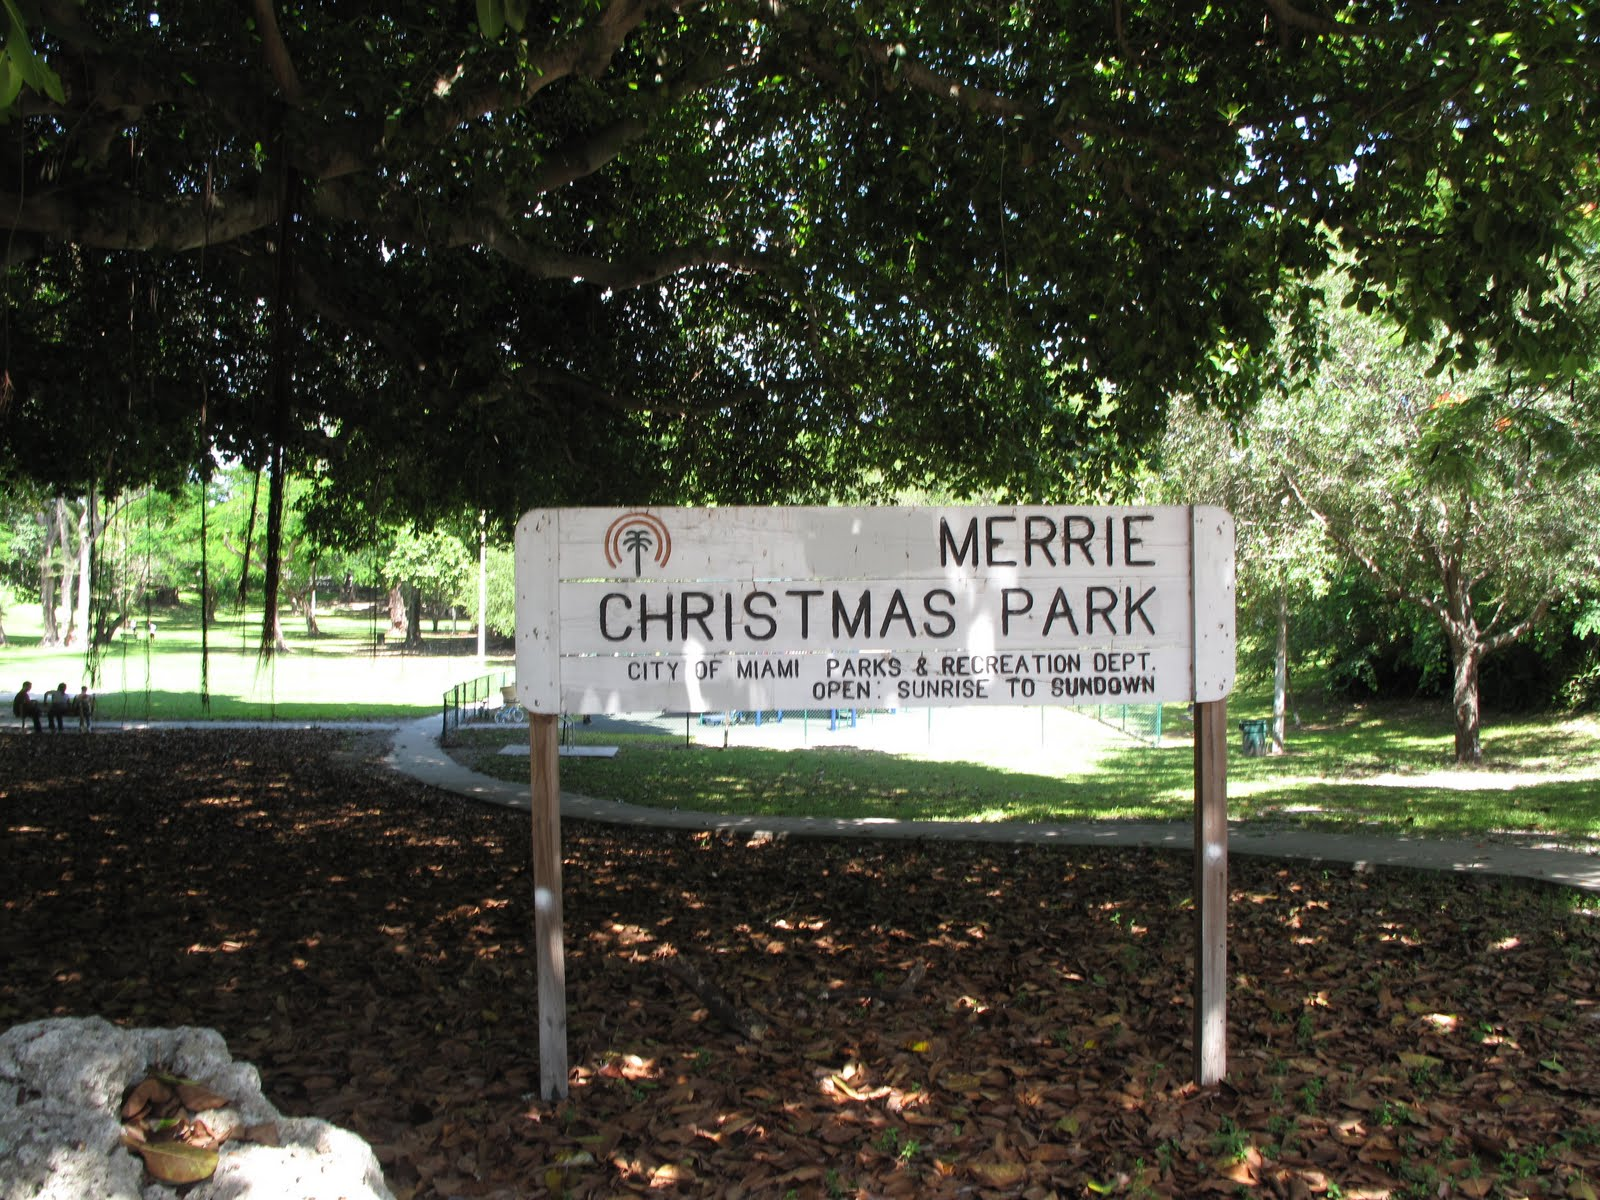 The Parks Department: Merrie Christmas Park